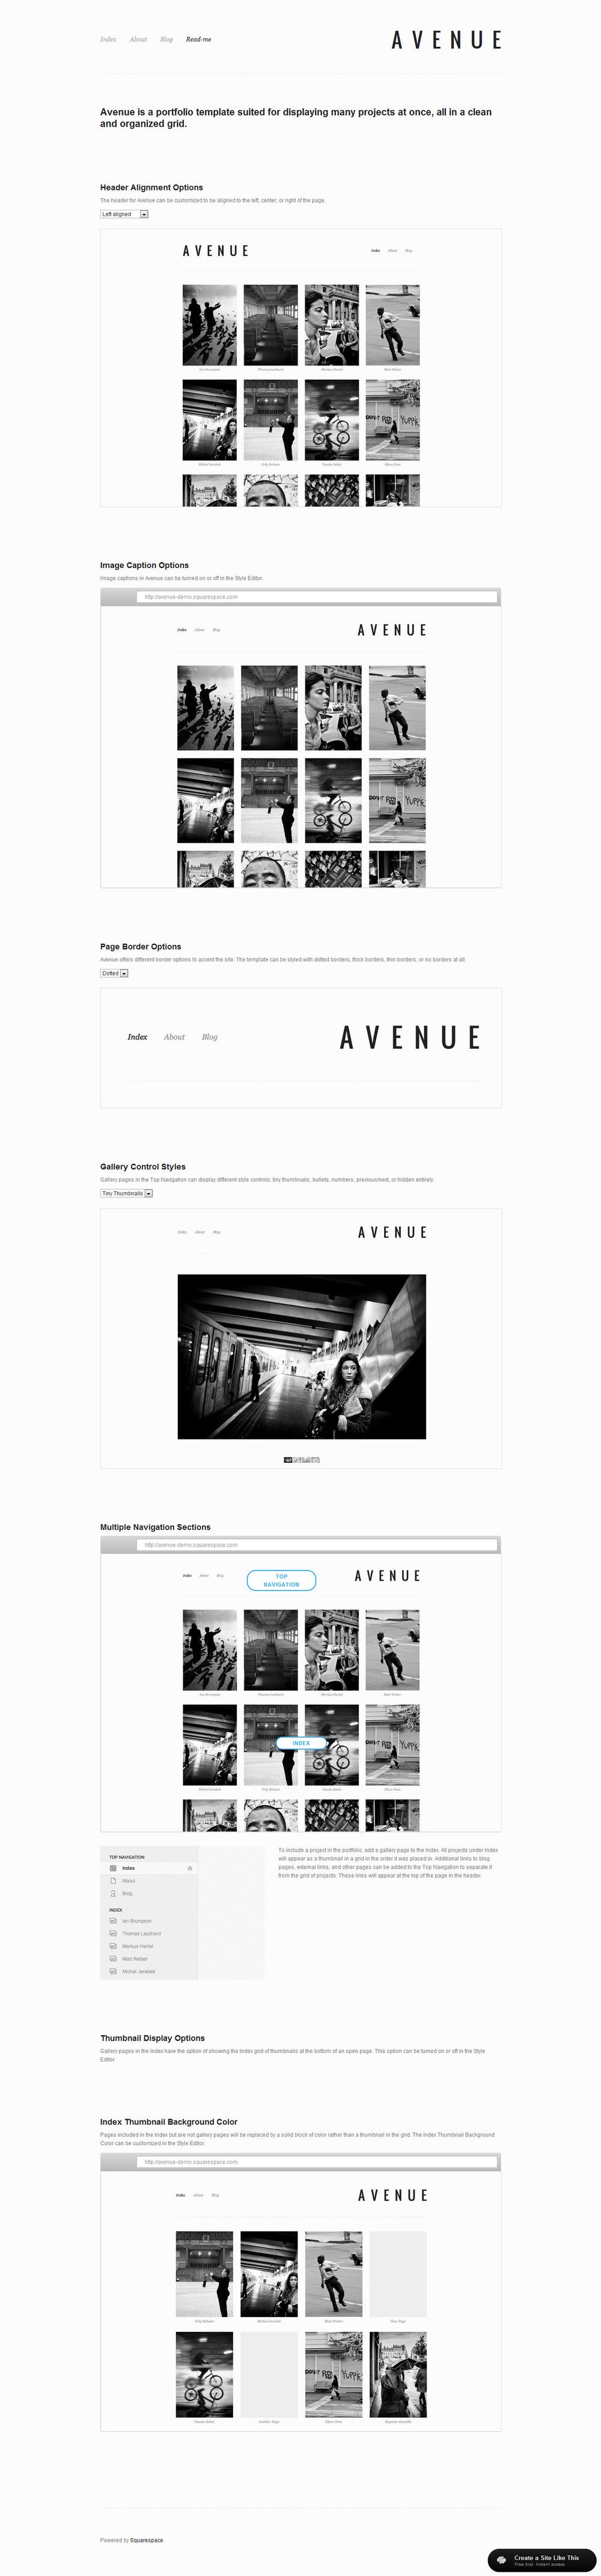 avenue-read-me.jpg